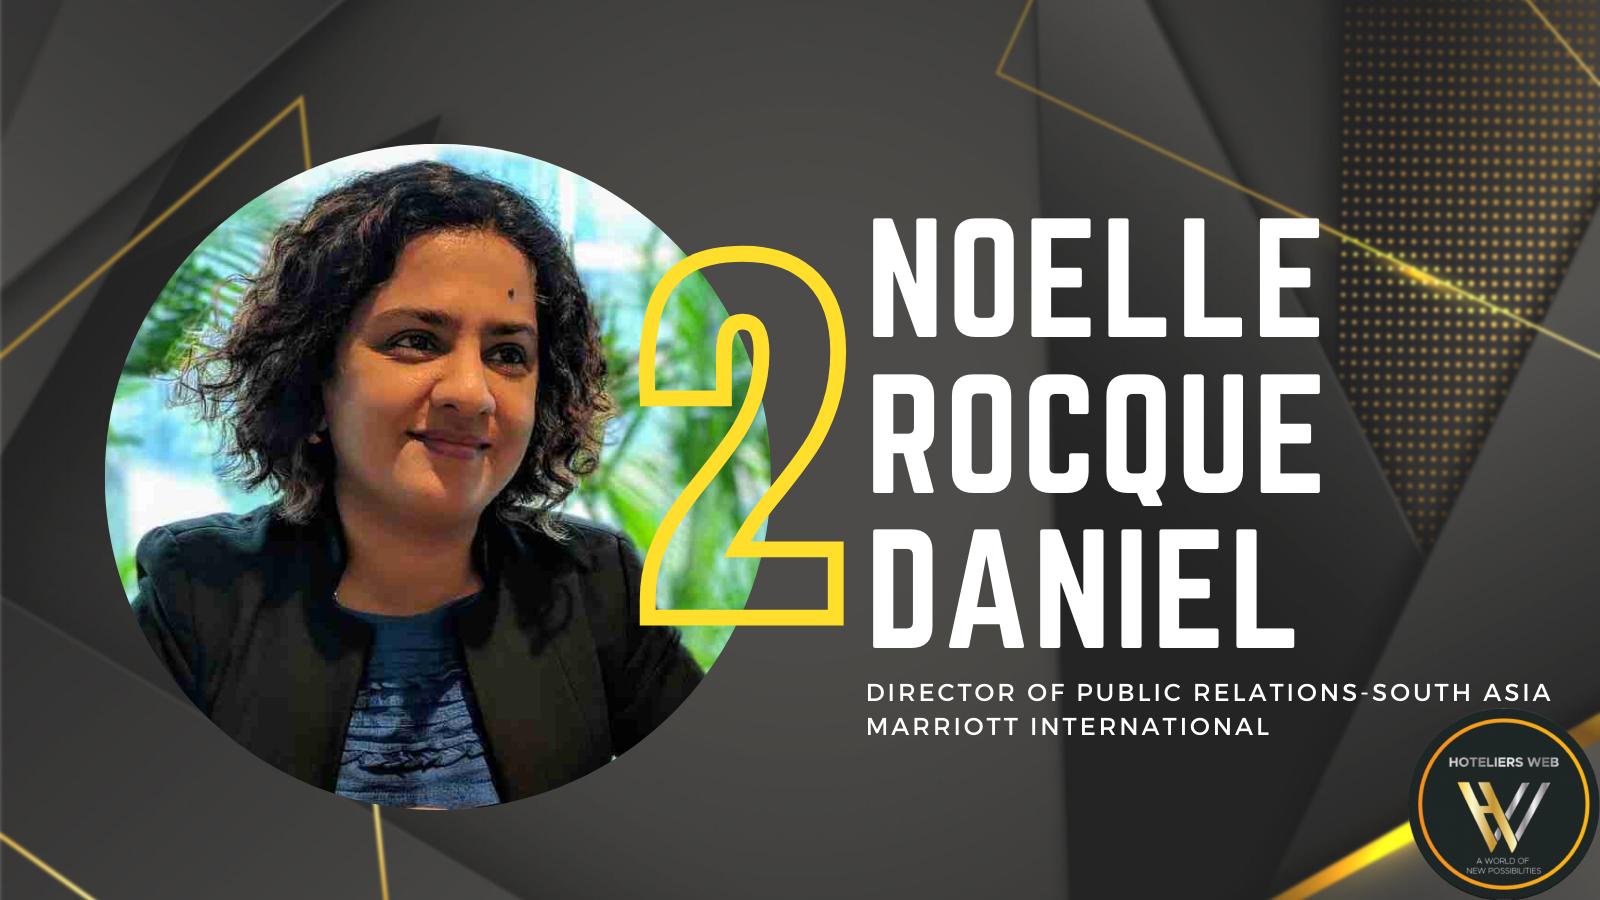 Noelle Rocque Daniel – Ranked 2 on Power 25 Marketing & PR 2021 by Hoteliers Web